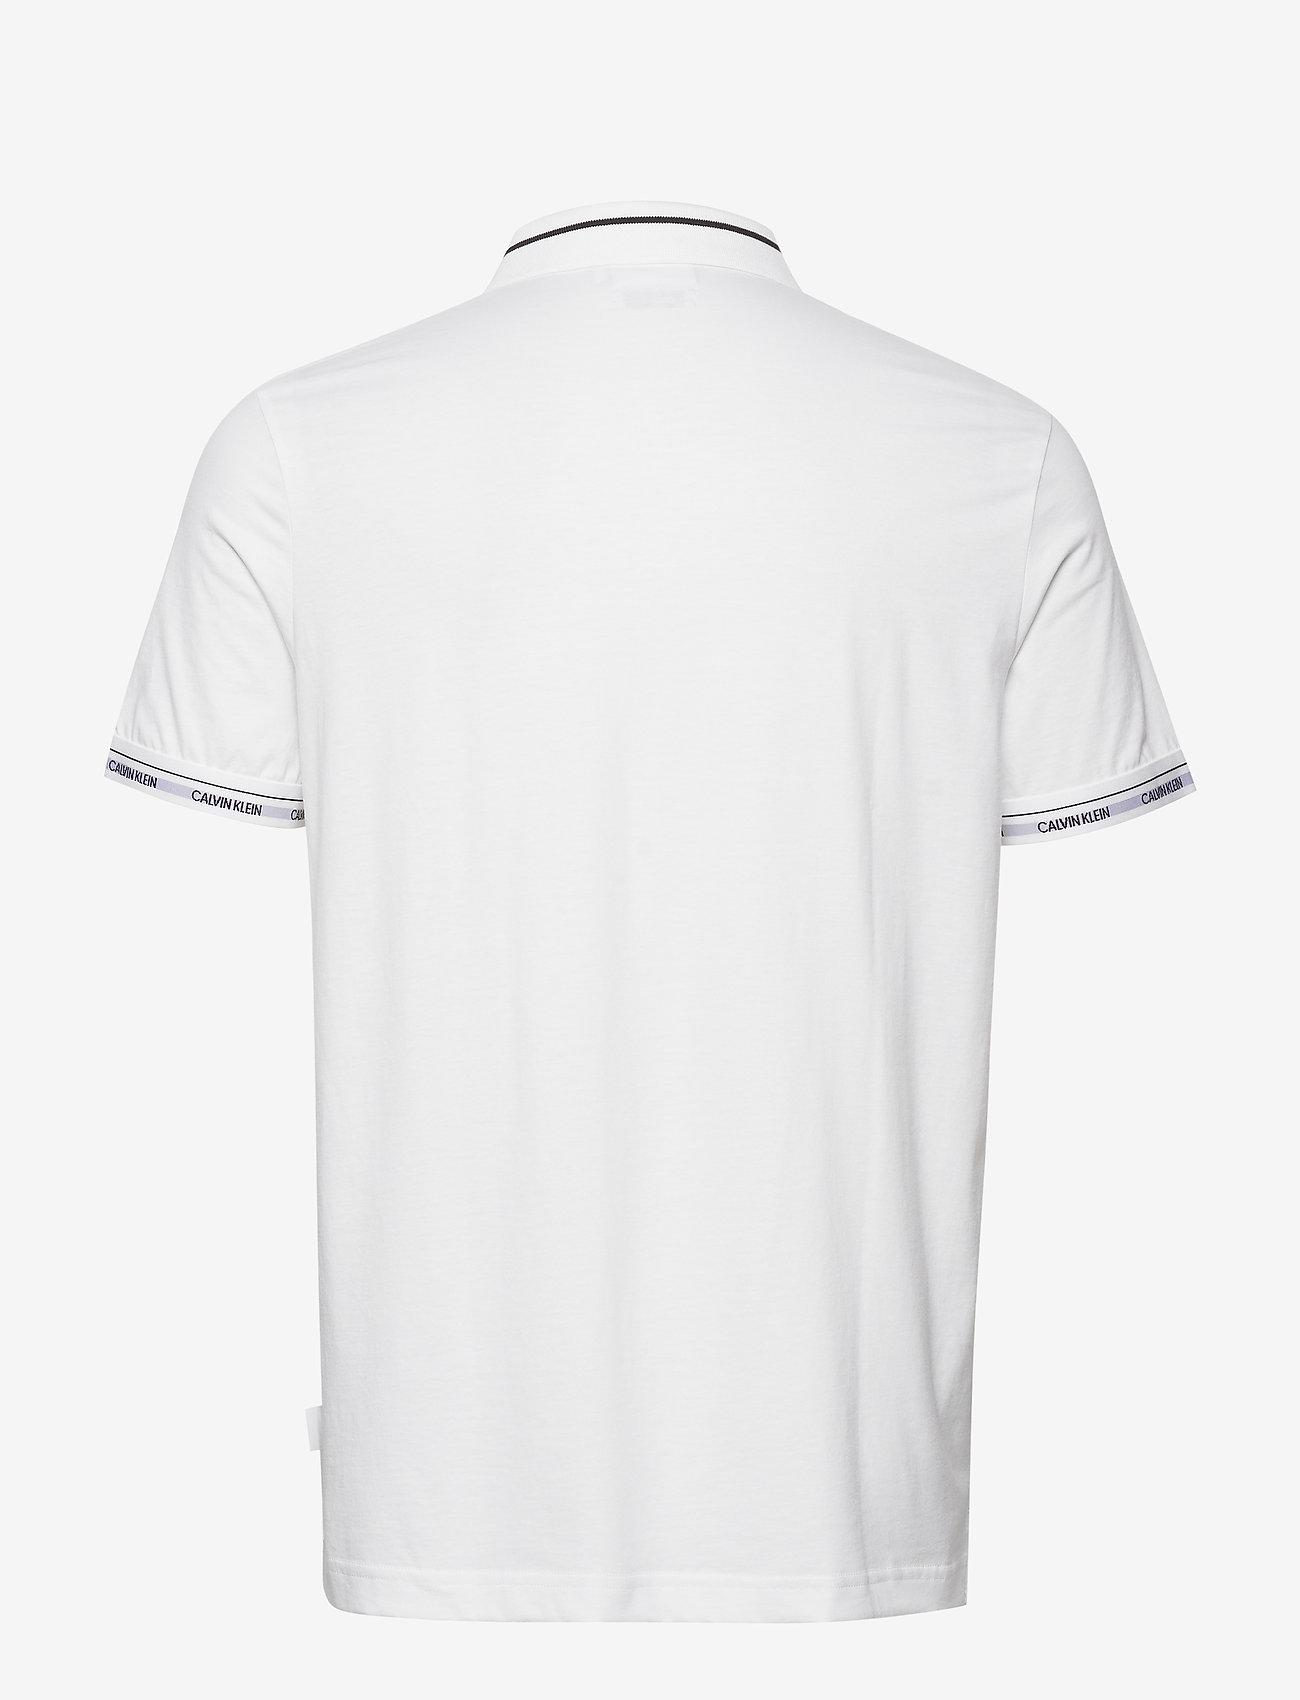 Calvin Klein - LIQUID TOUCH LOGO CUFF POLO - korte mouwen - bright white - 1